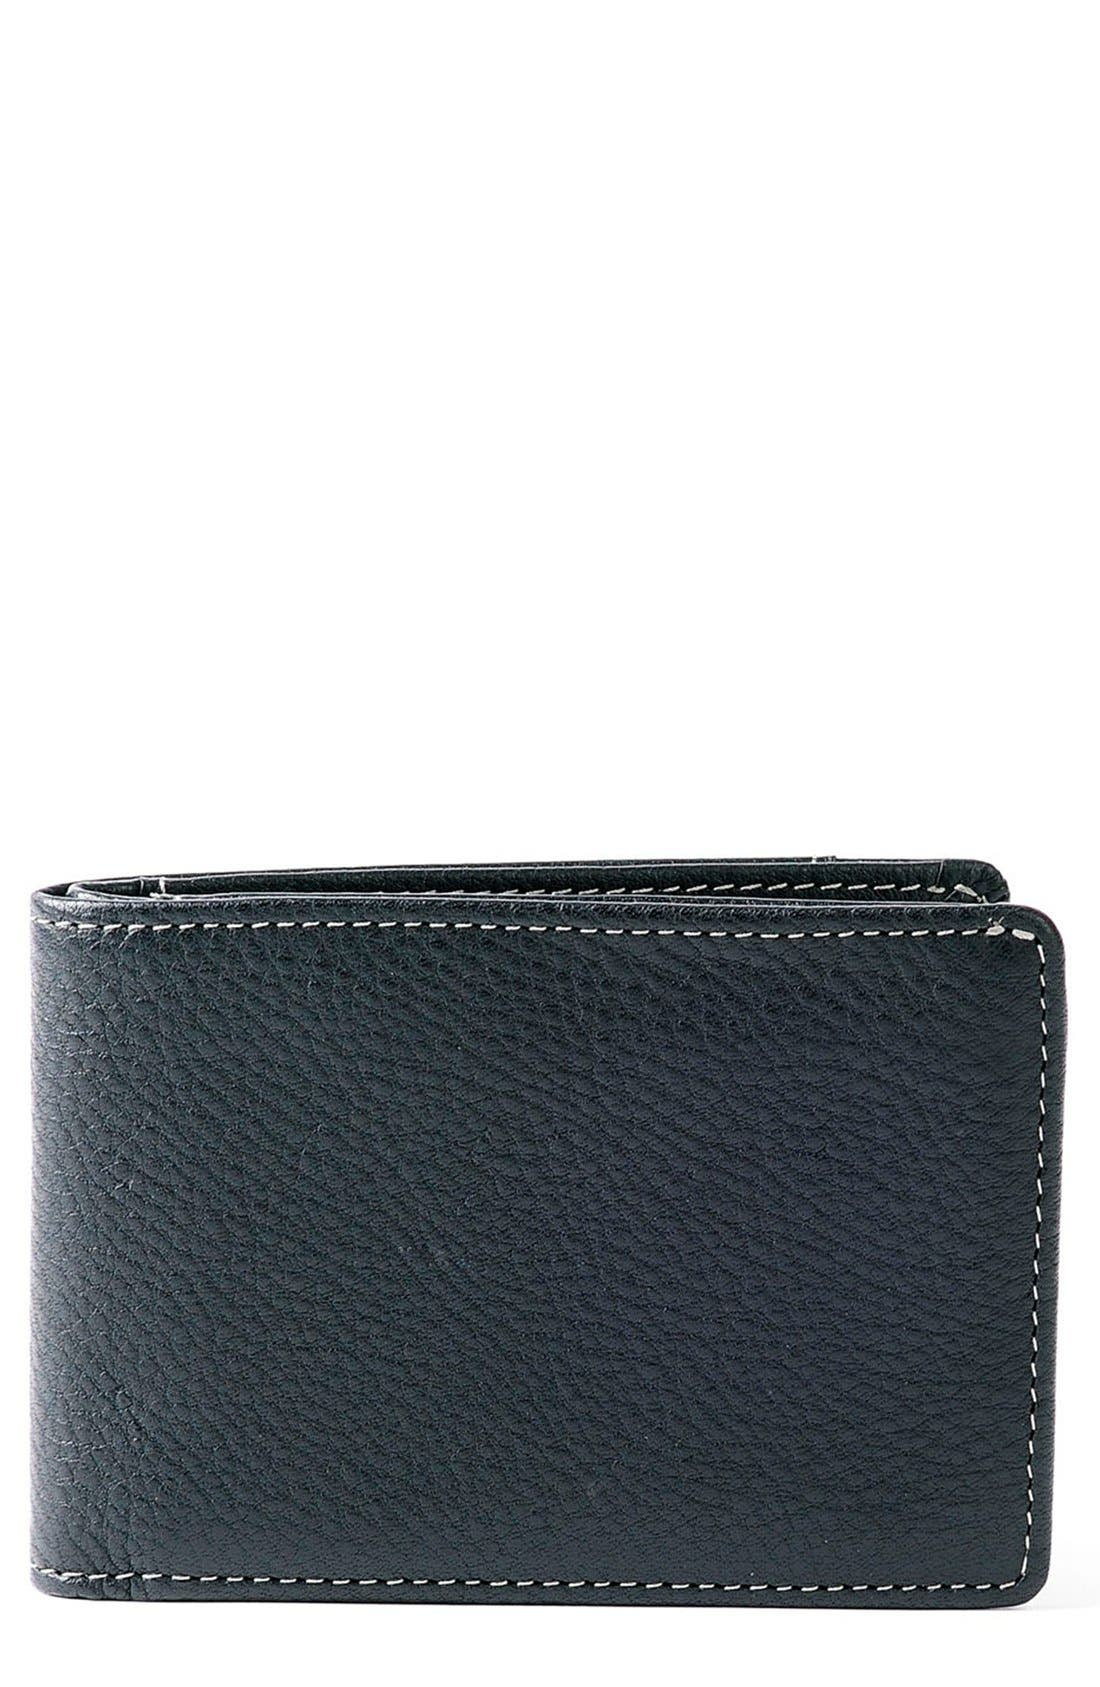 Alternate Image 1 Selected - Boconi 'Tyler' RFID Slimster Wallet